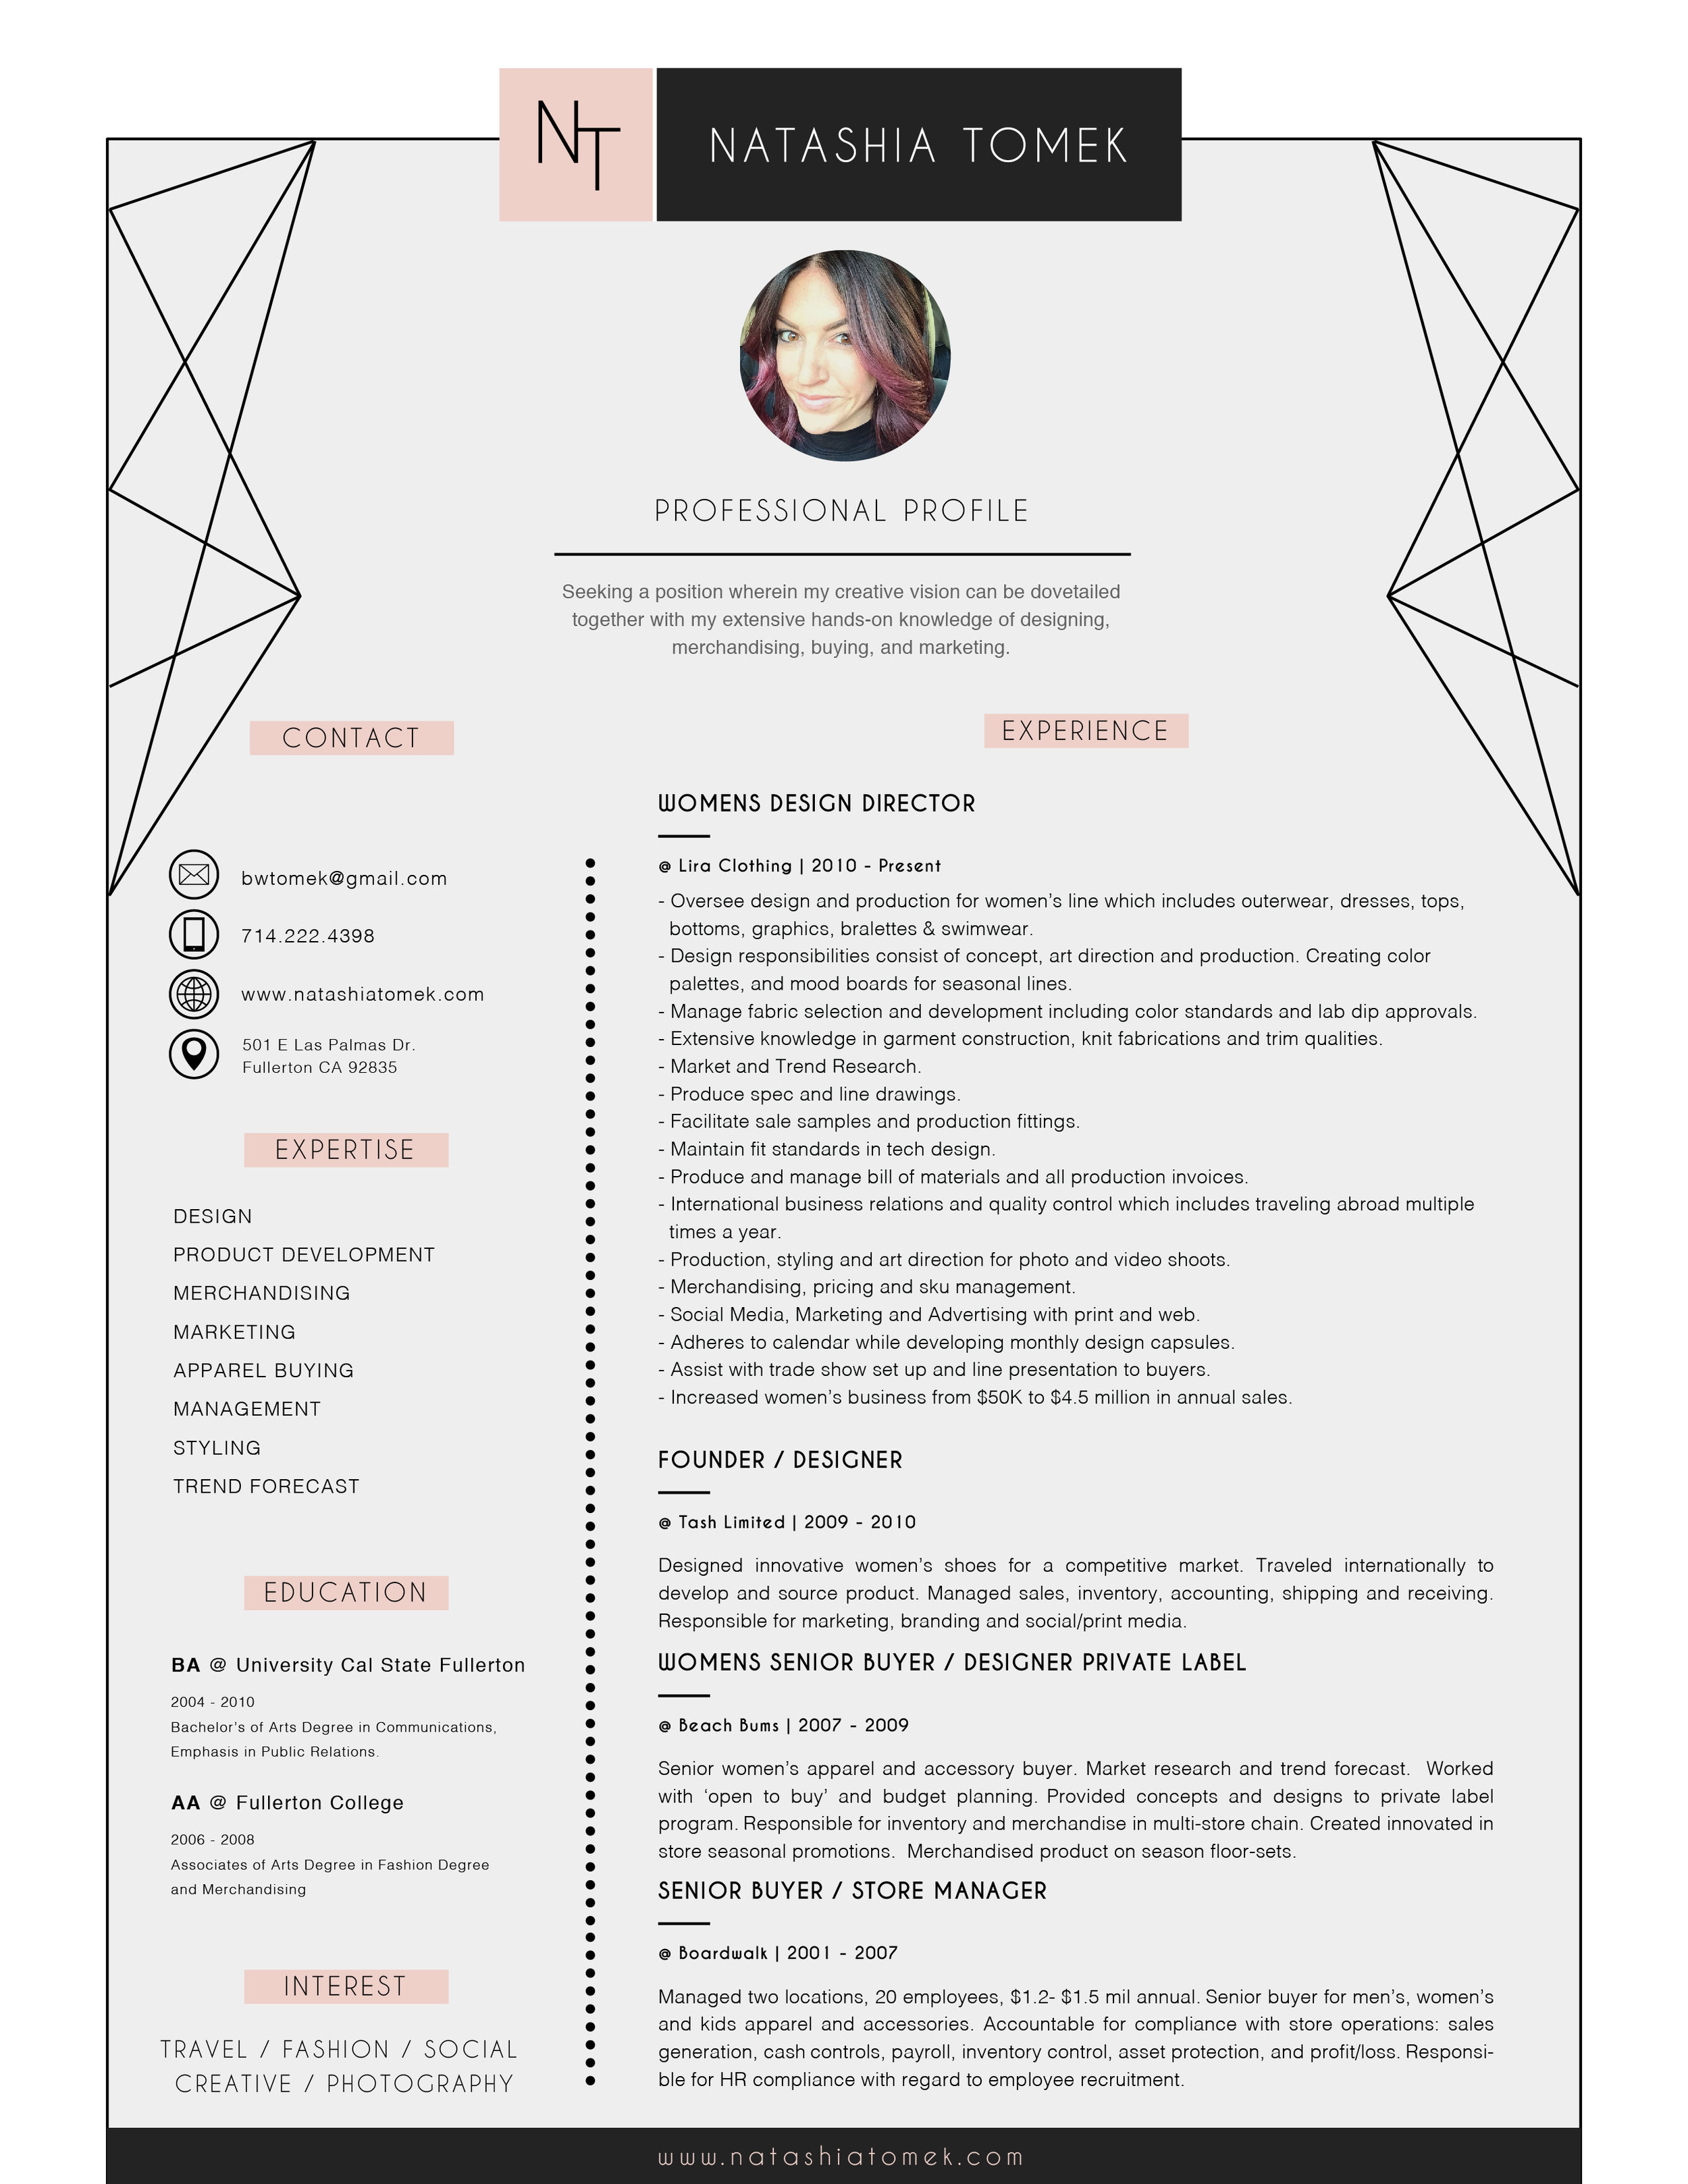 Natashia Tomek Resume Web.jpg